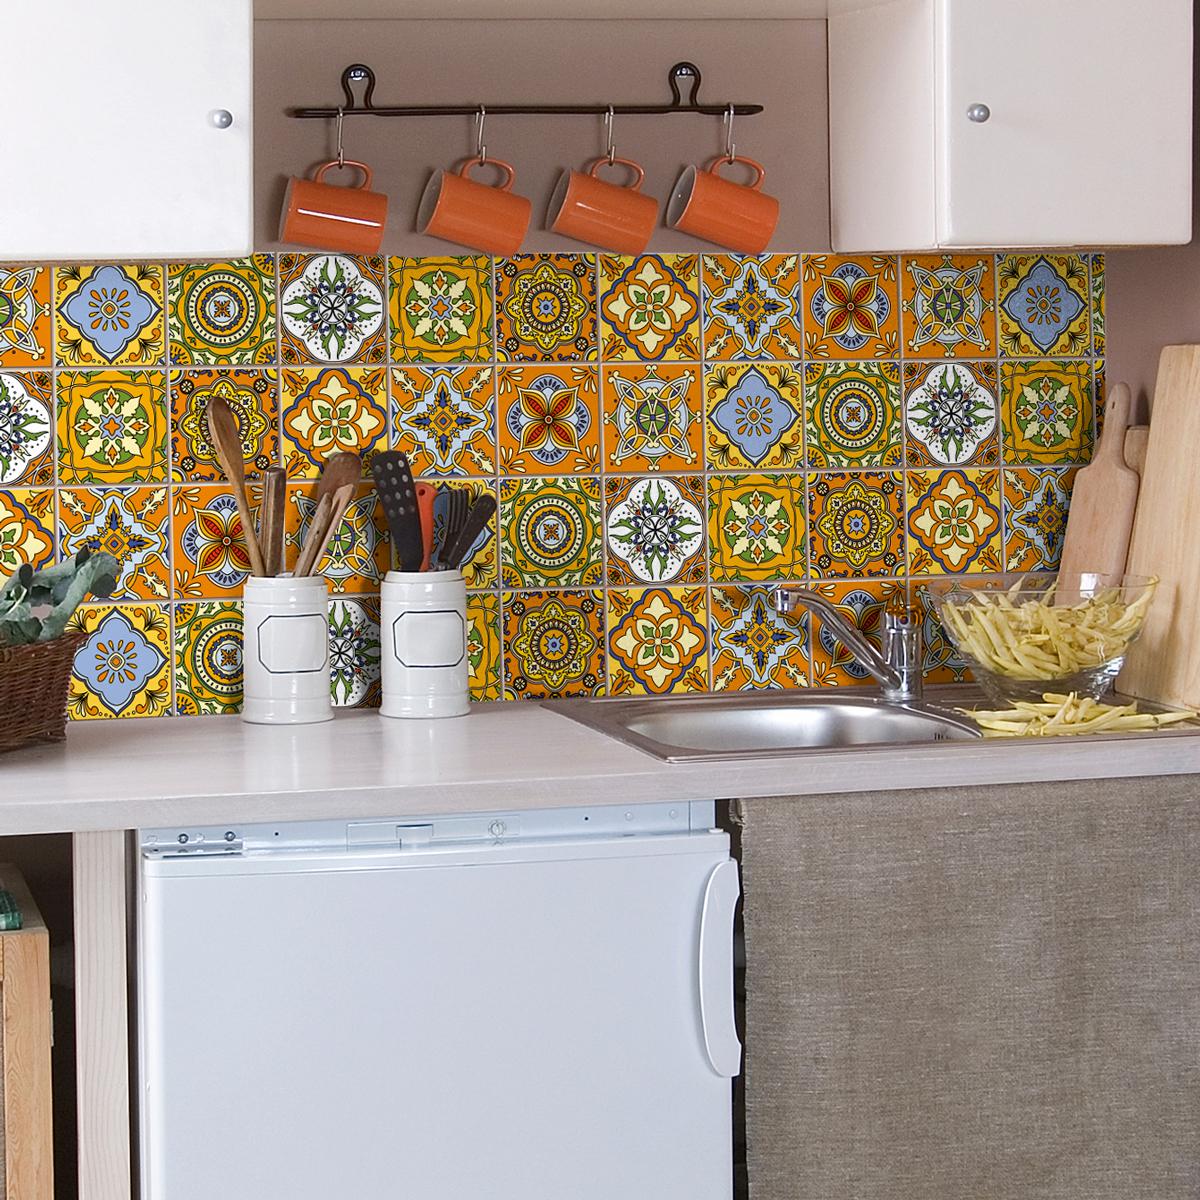 9 stickers carrelages azulejos ornements mosa ques anciens art et design artistiques. Black Bedroom Furniture Sets. Home Design Ideas